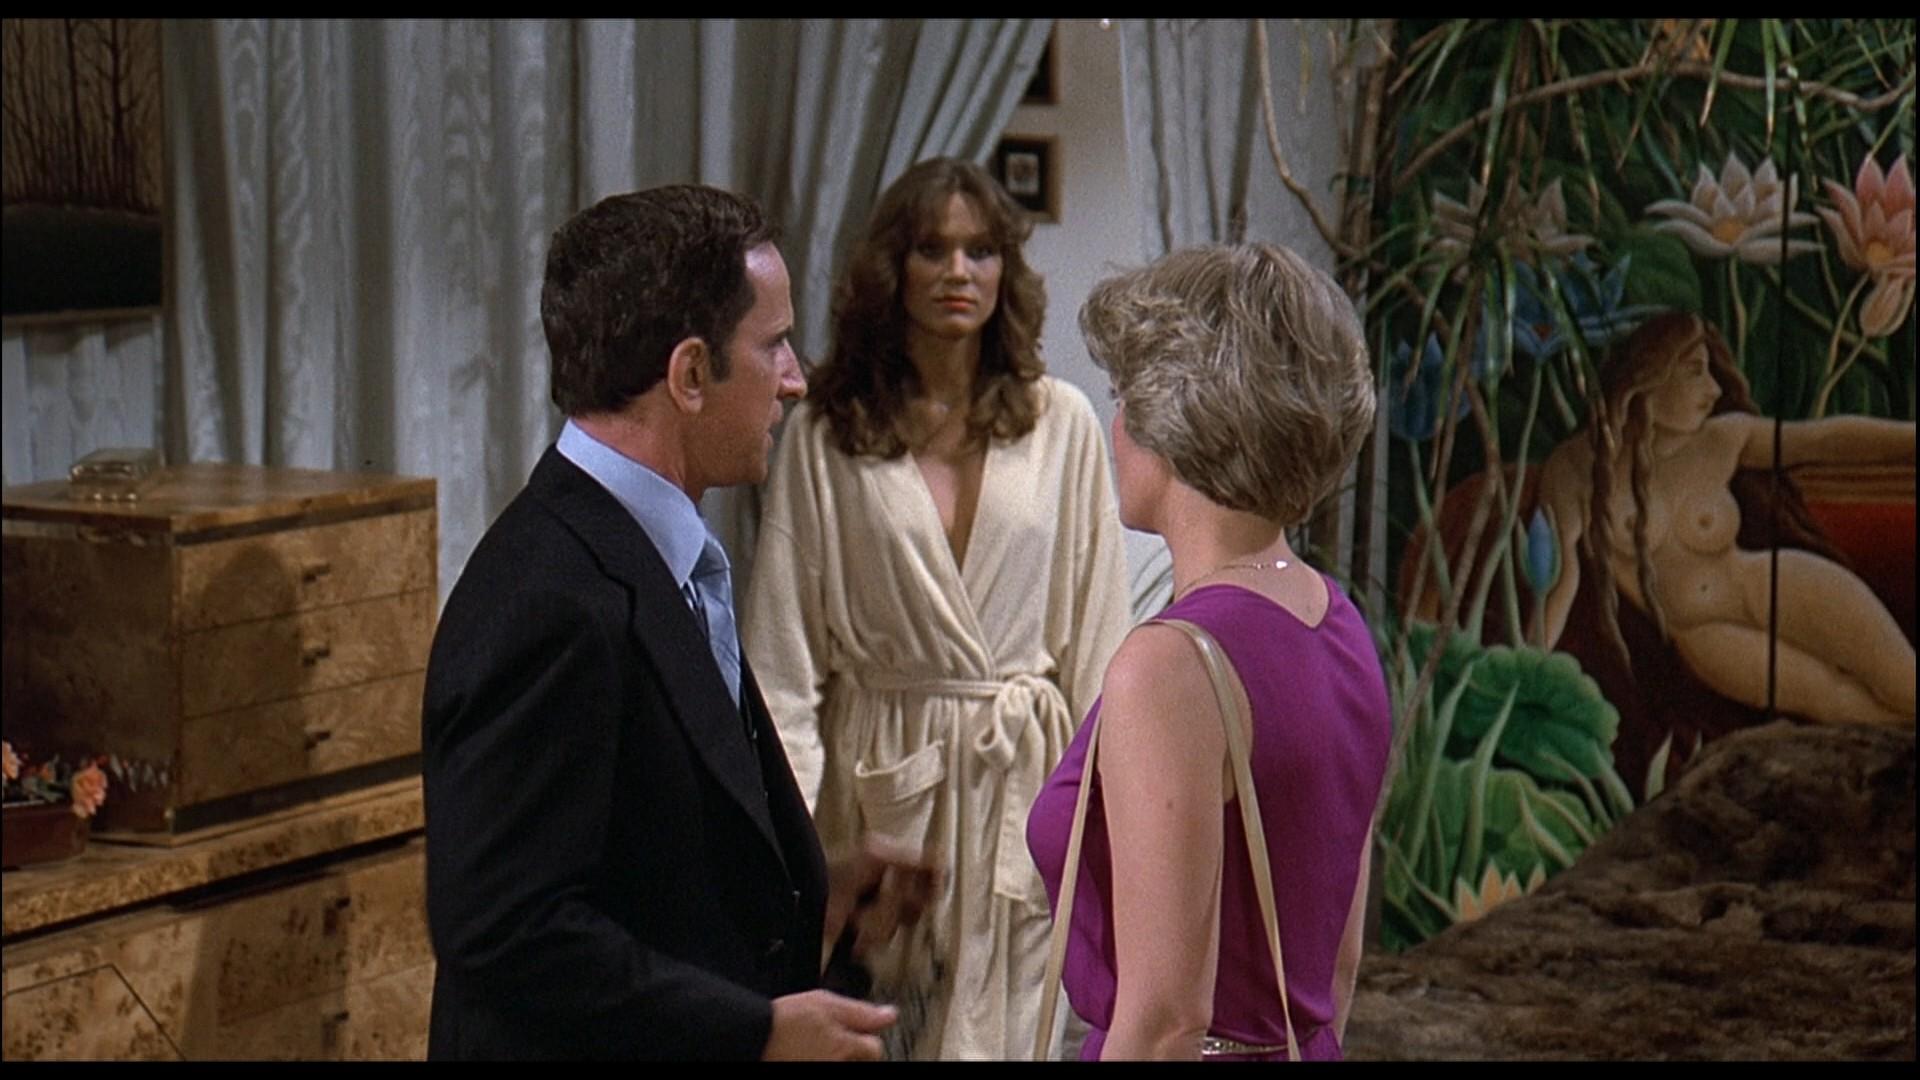 Cheré Bryson busty see through Andrea Howard, Pamela Hensley hot - The Nude Bomb (1980) HD 1080p BluRay (6)